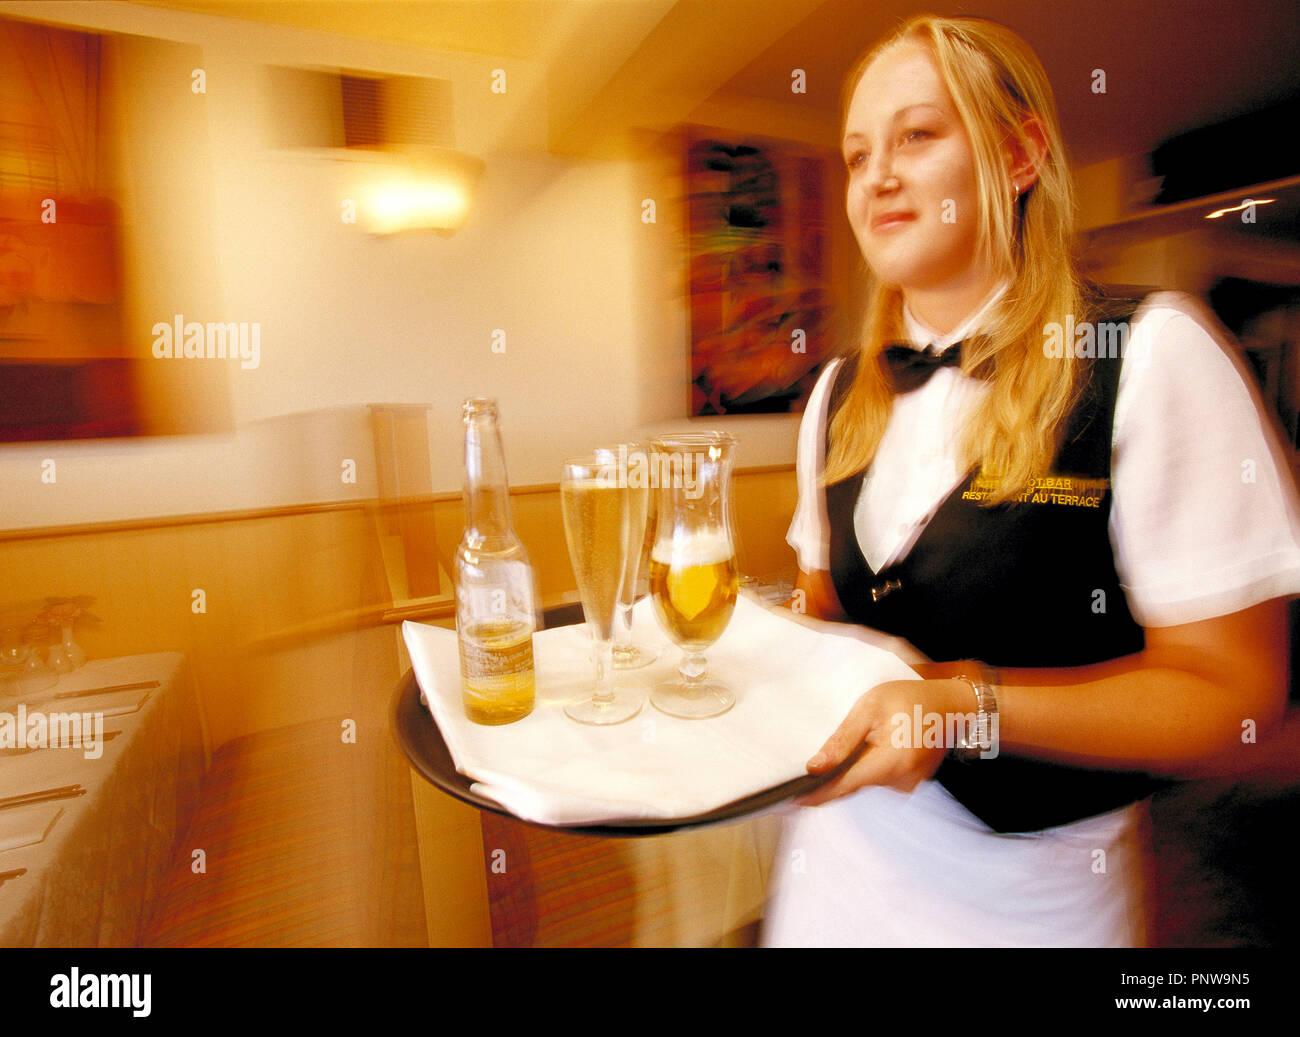 Junge blonde Frau Kellnerin mit Getränke Fach im Café Restaurant Bar. Stockbild